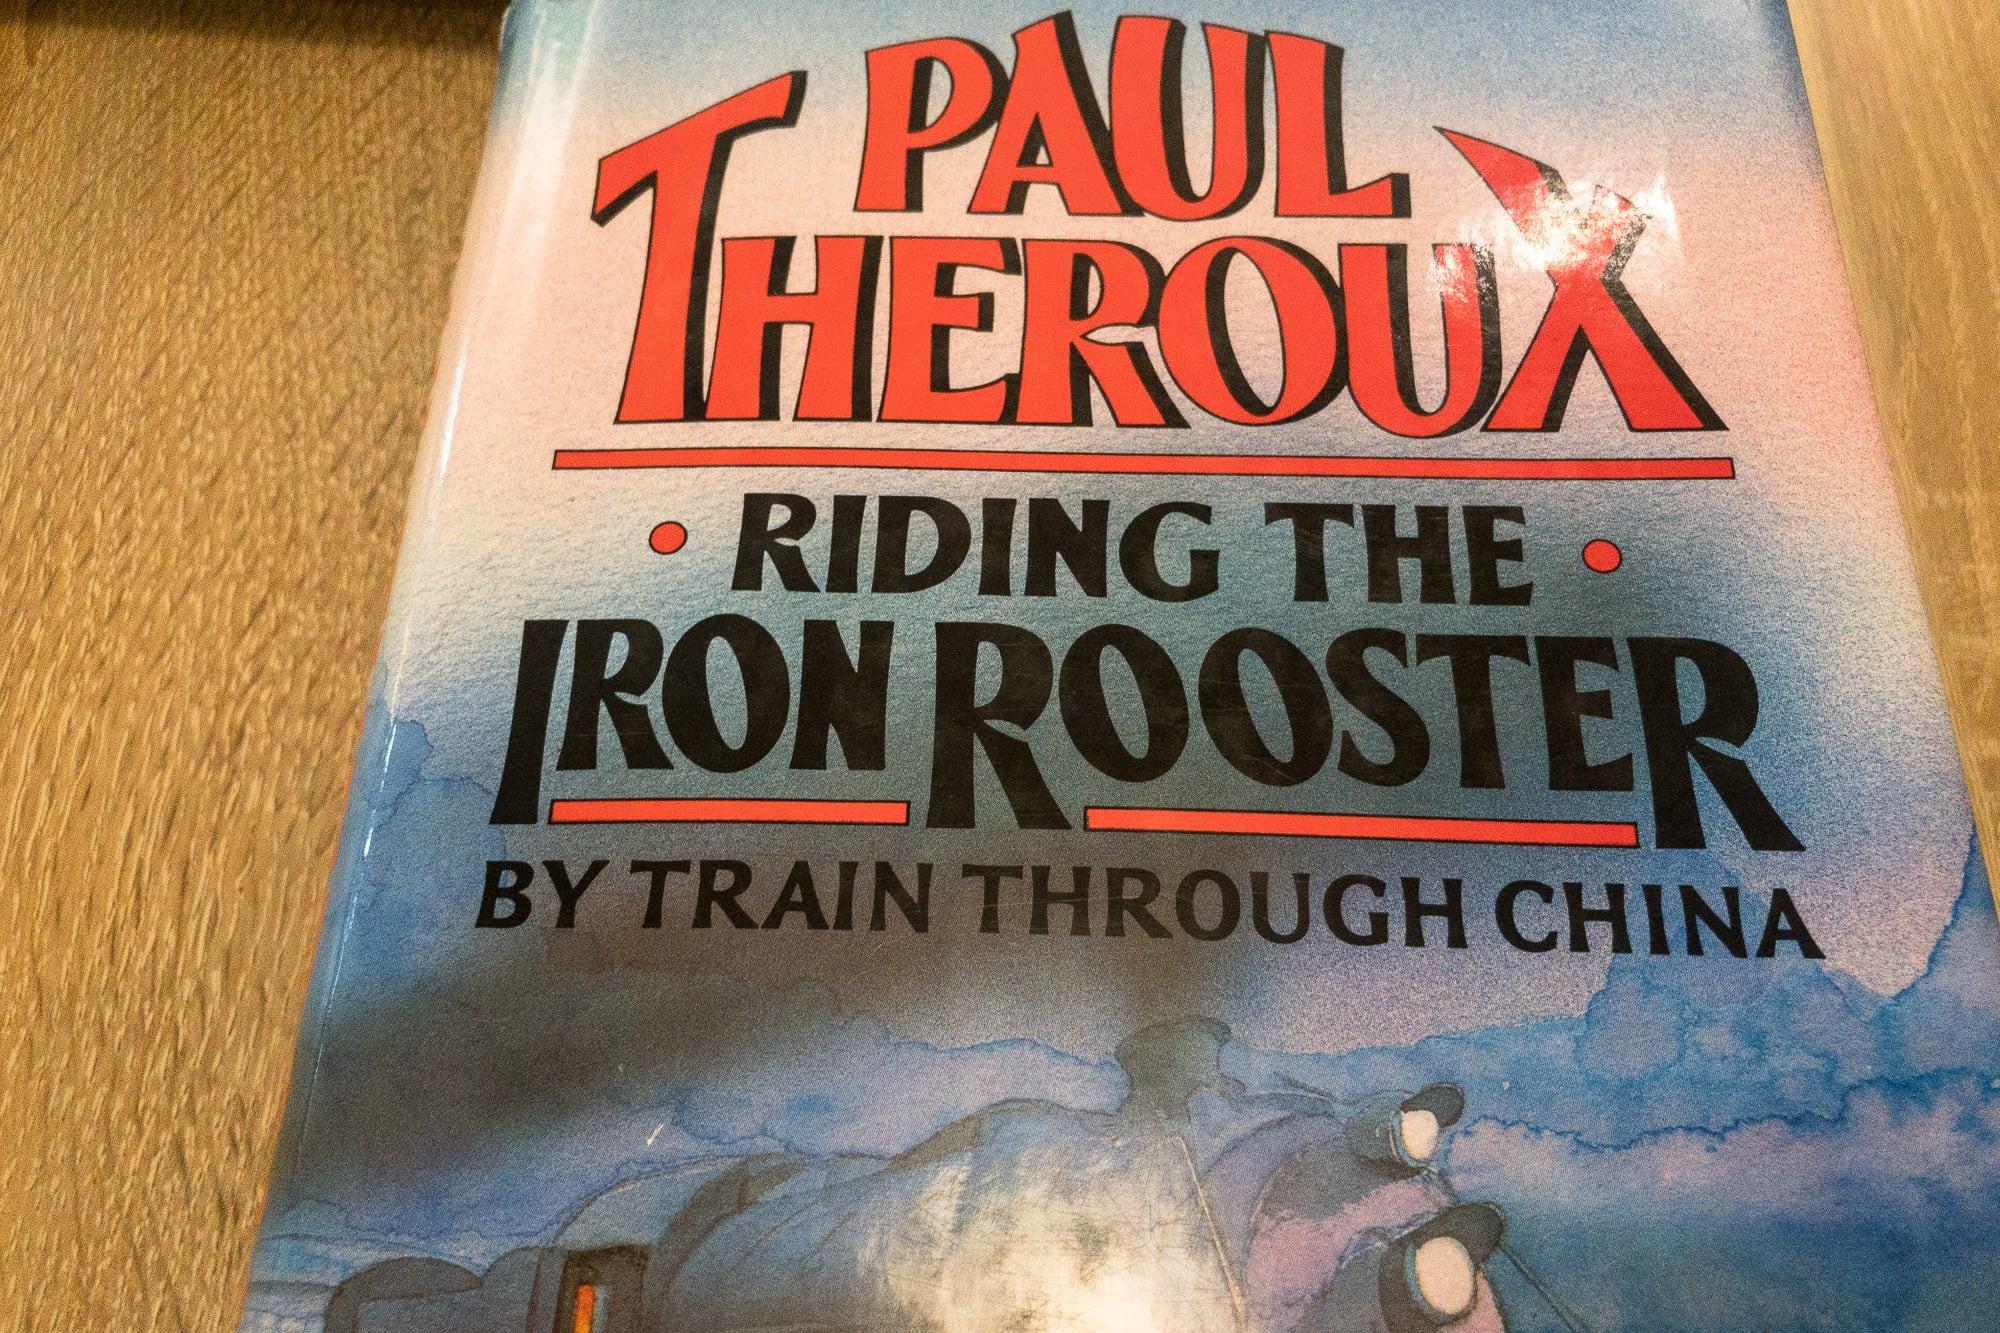 Paul Theroux